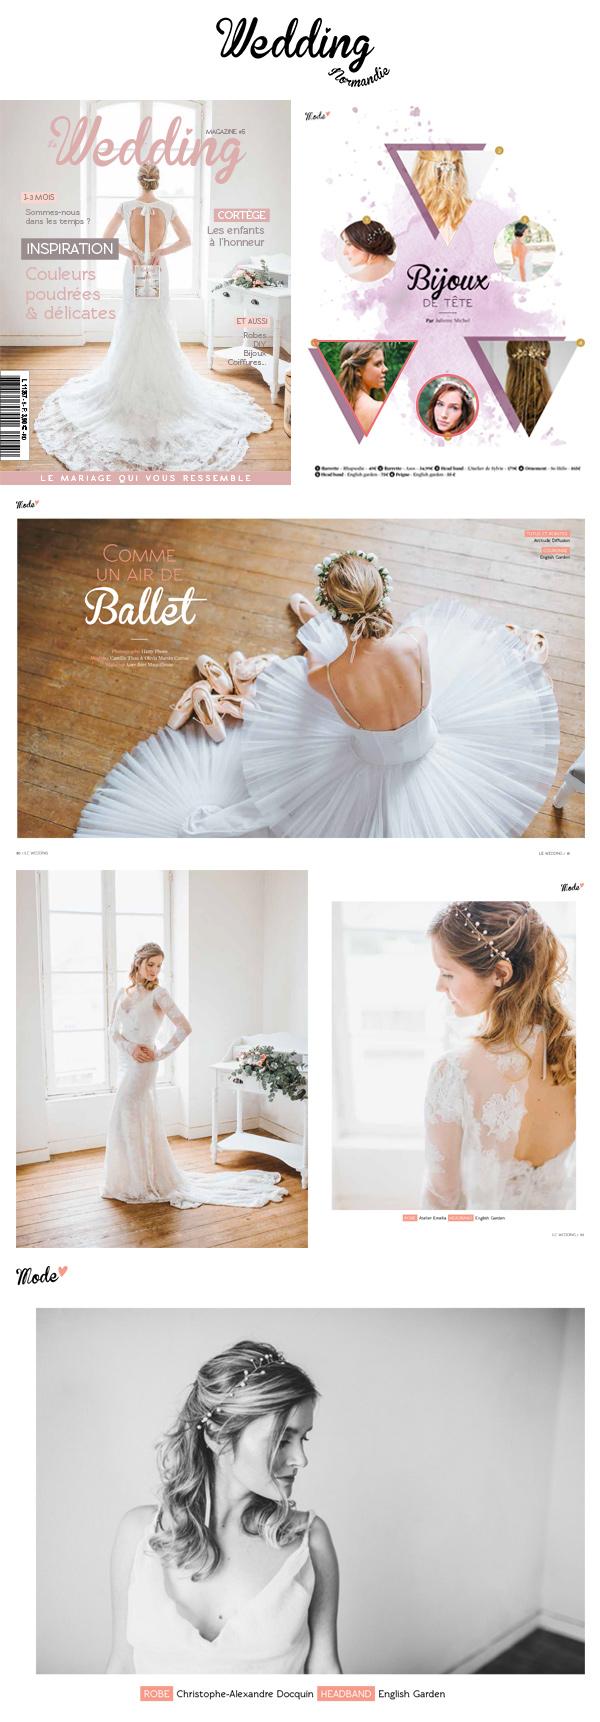 Article Le Wedding